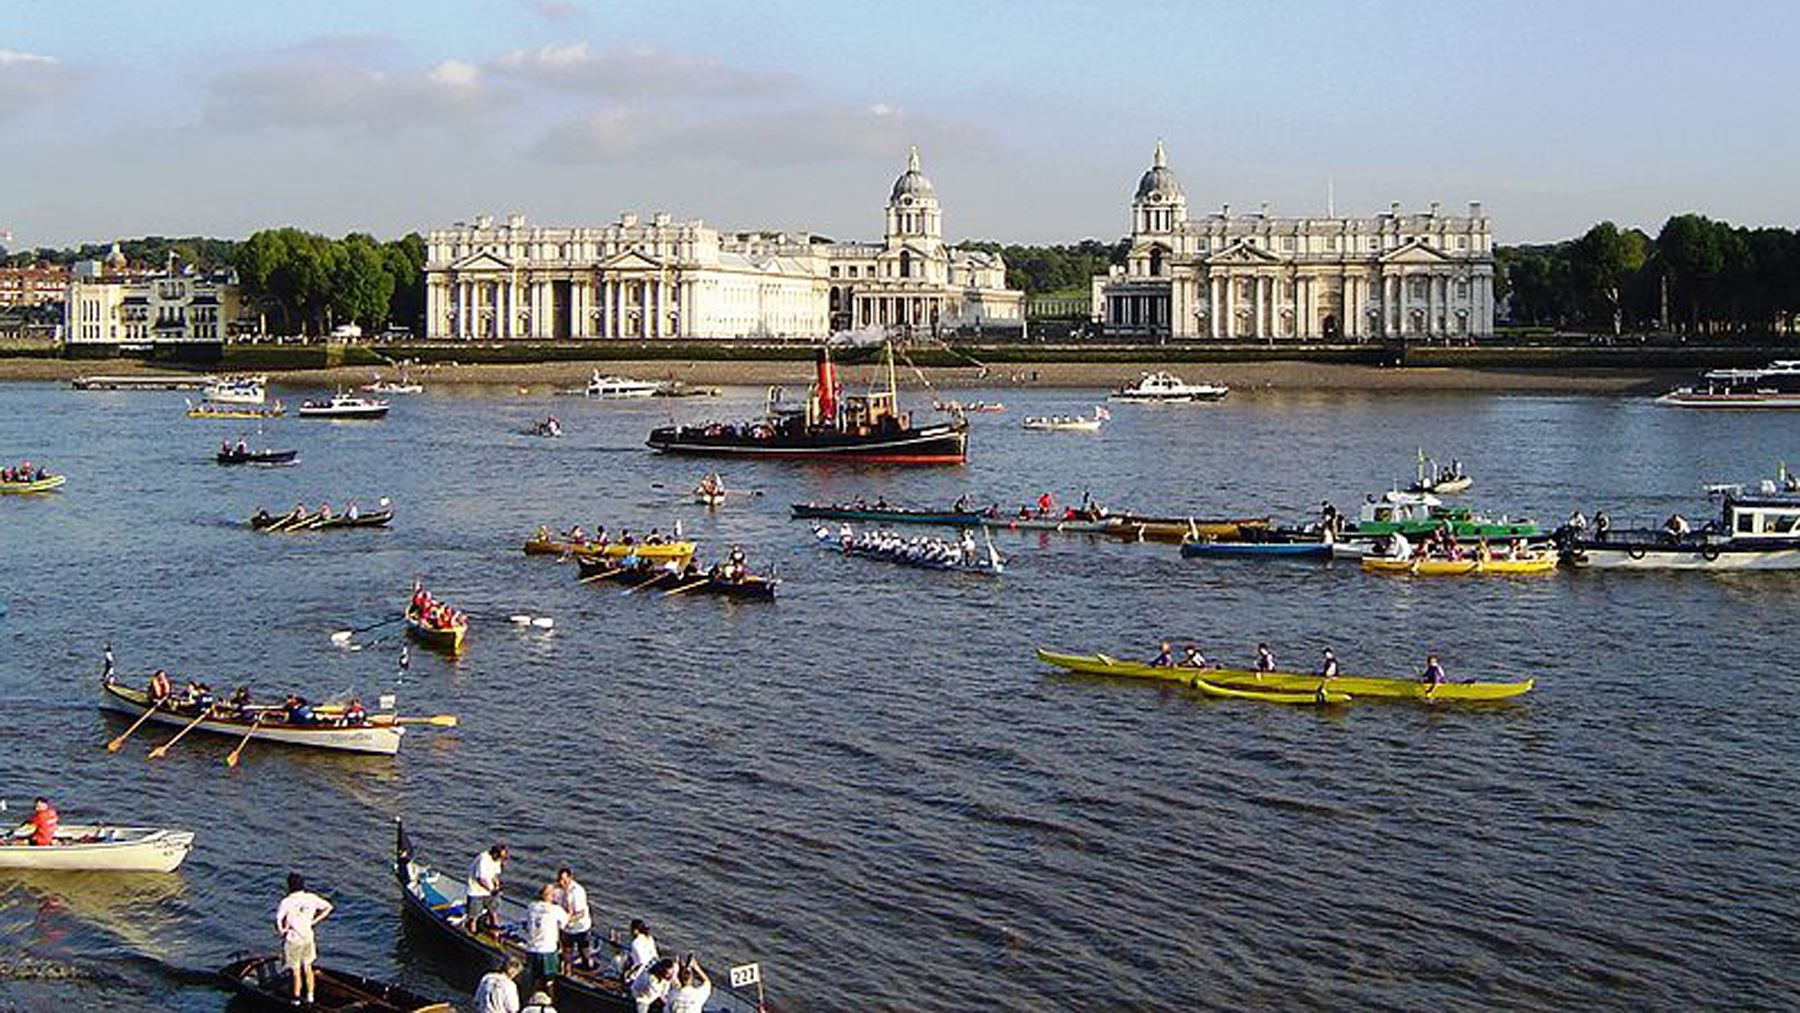 Have you heard of London's river marathon...?